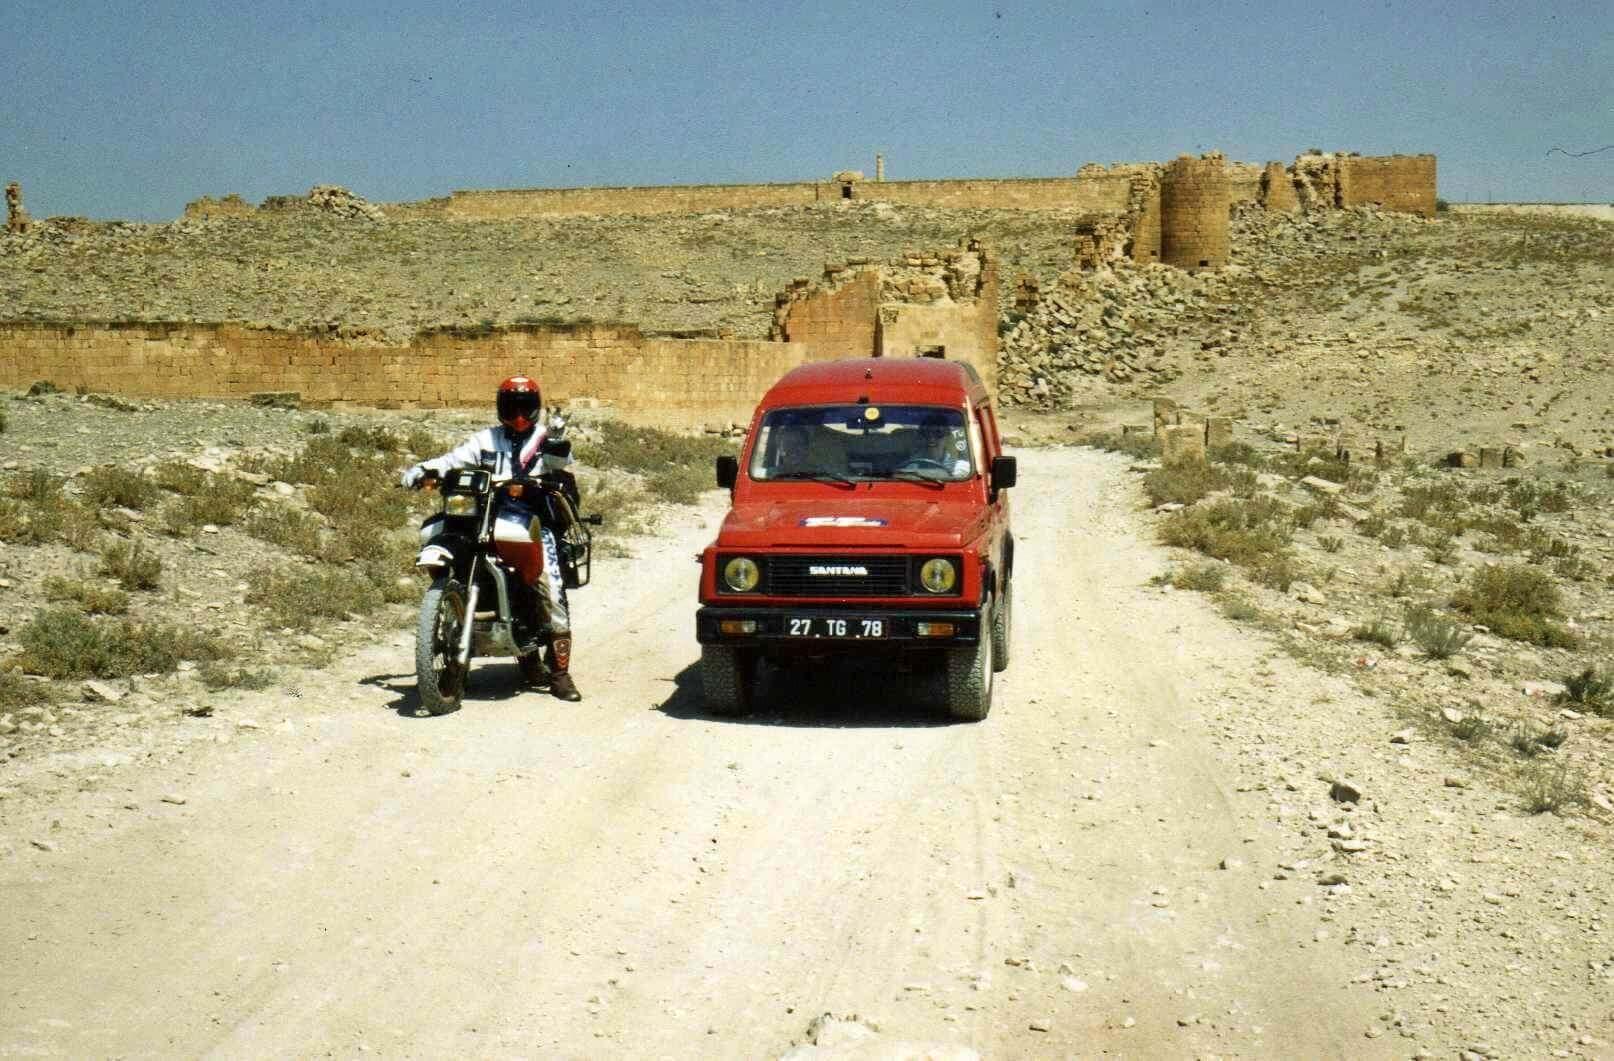 Raid moto 4x4 Tunisie Wild Spot El Kef Chebika - Ruines Haidra